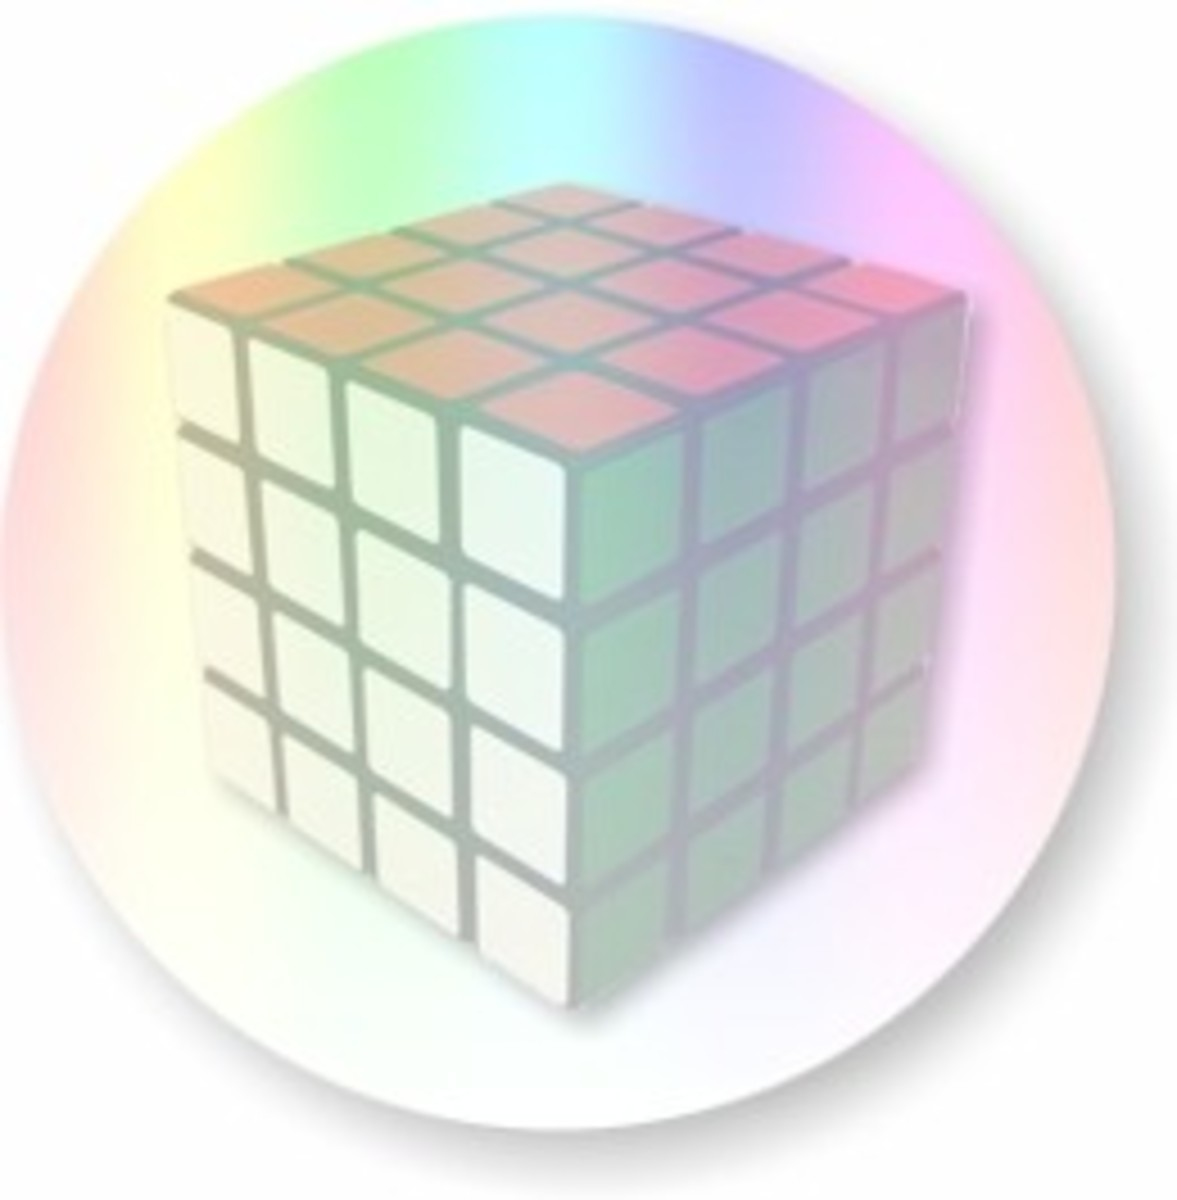 rubiks 4x4 cube solution